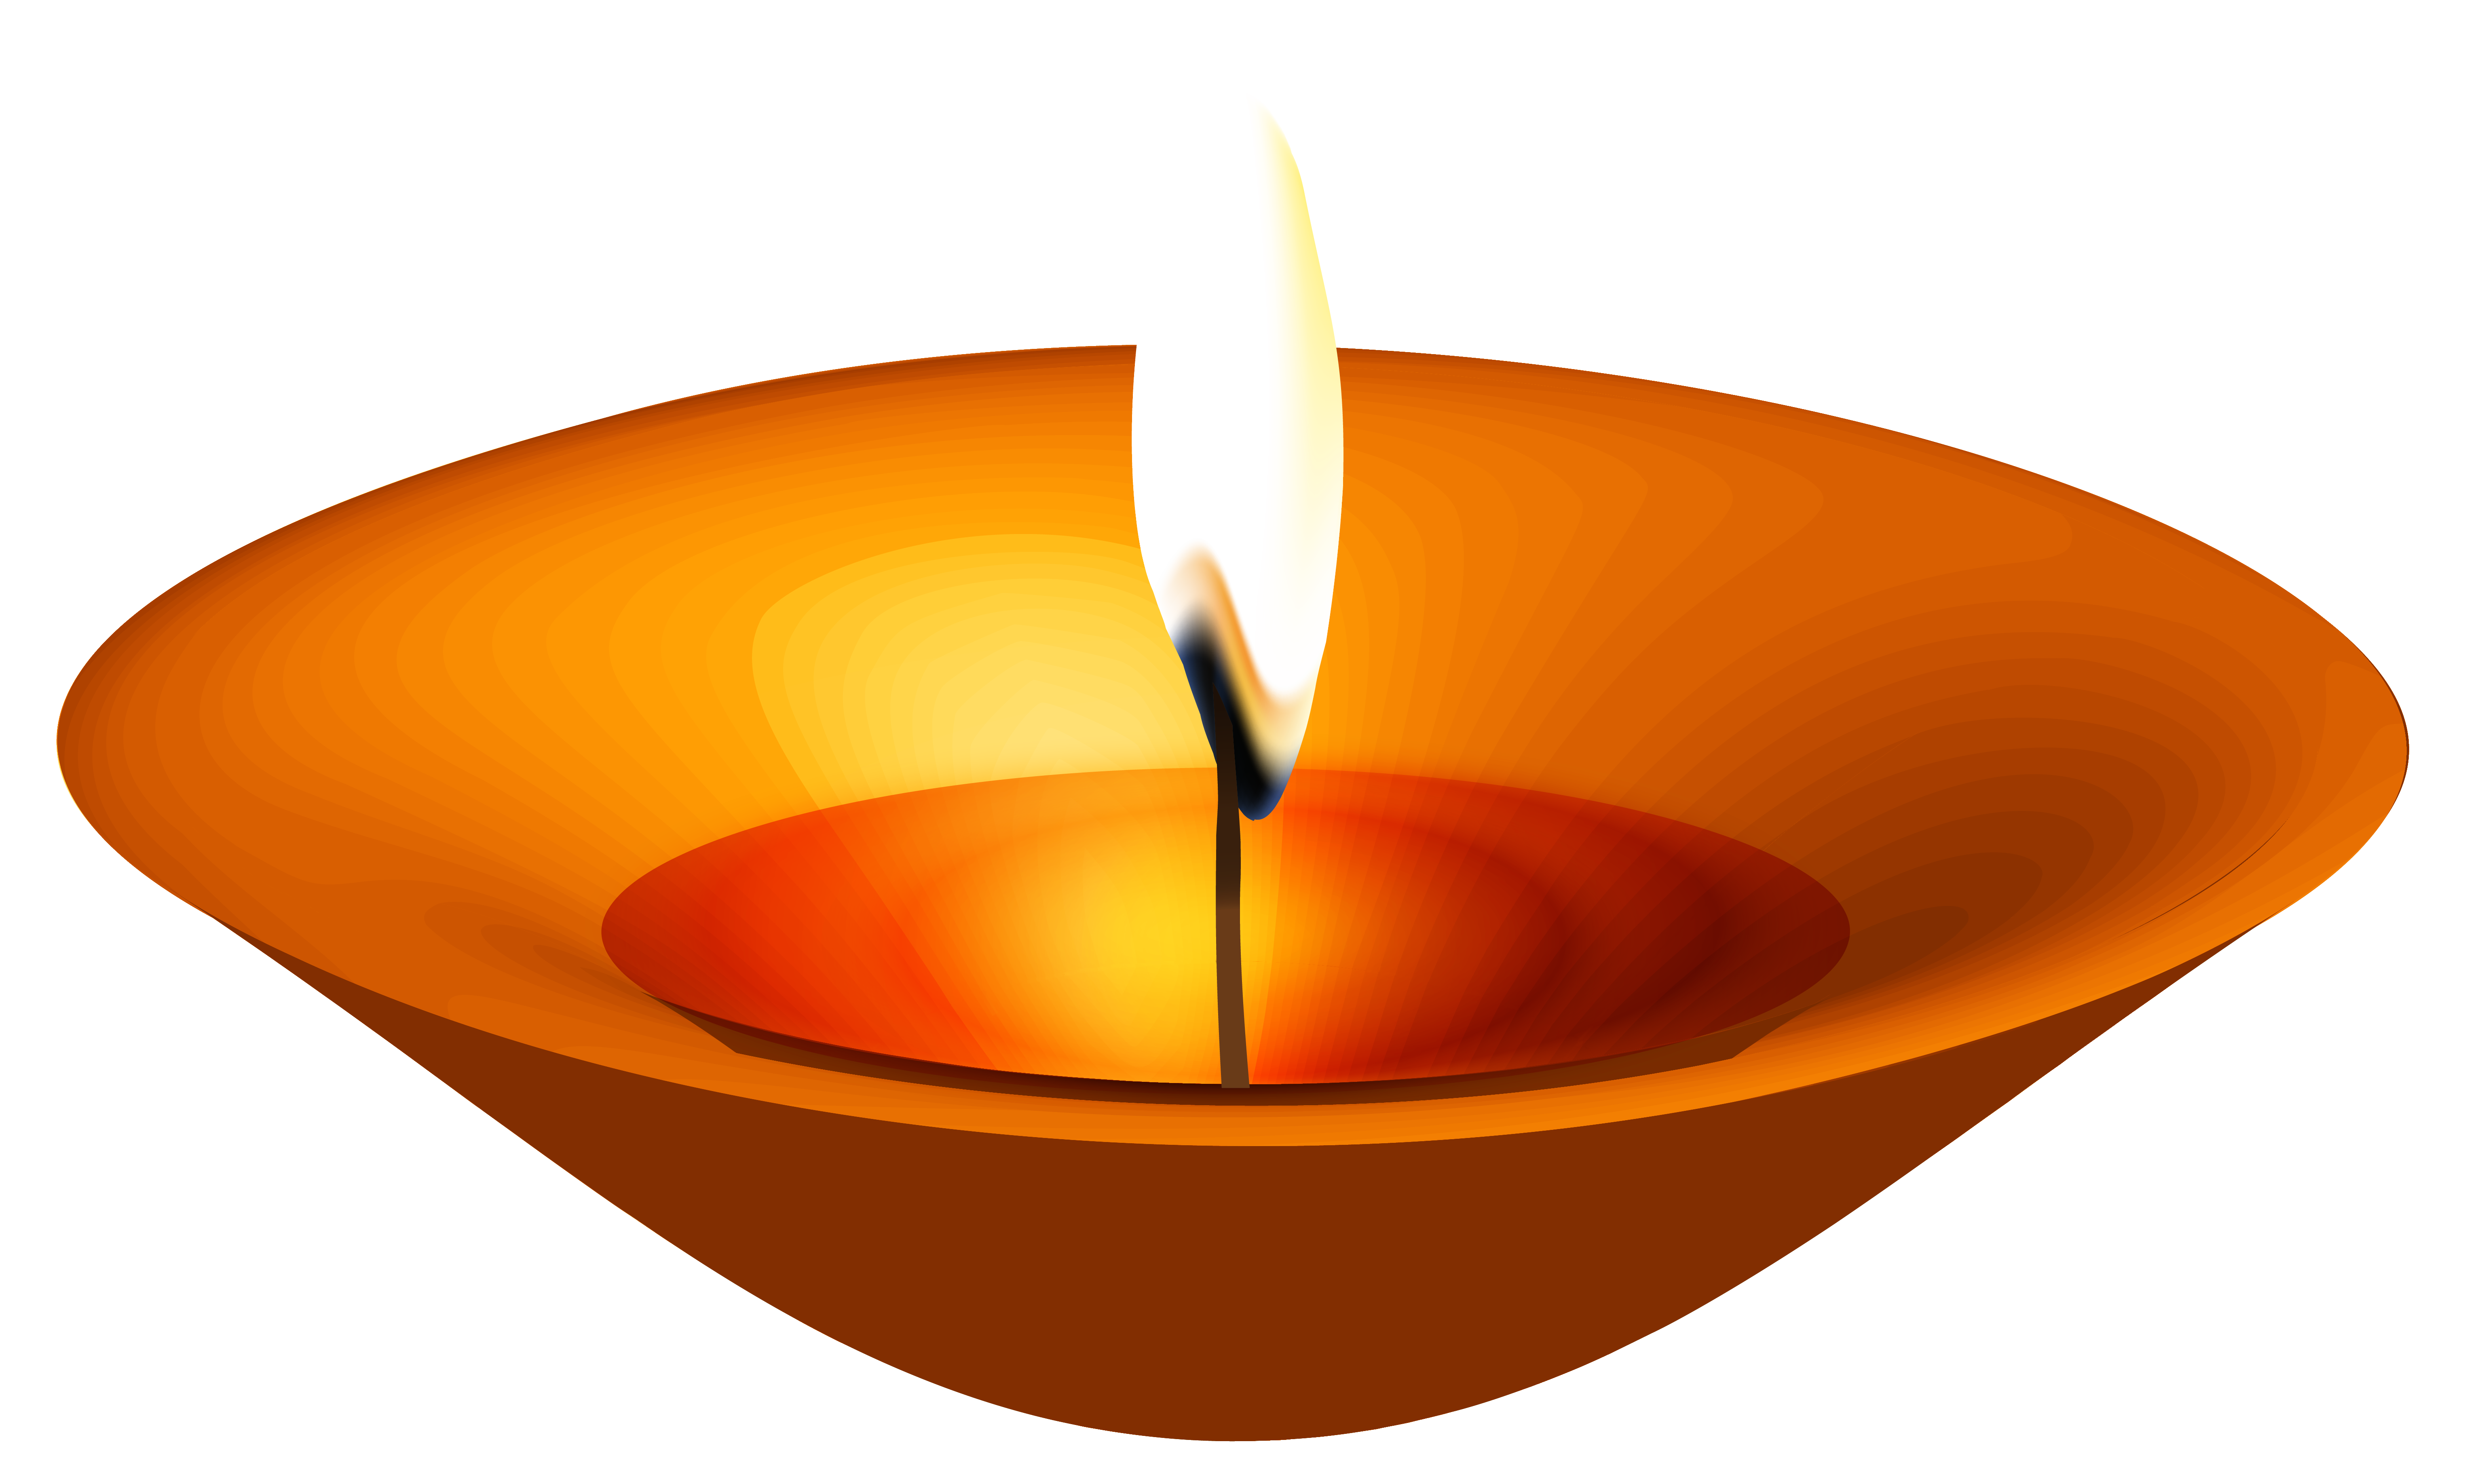 Clipart children diwali. Candle png image places